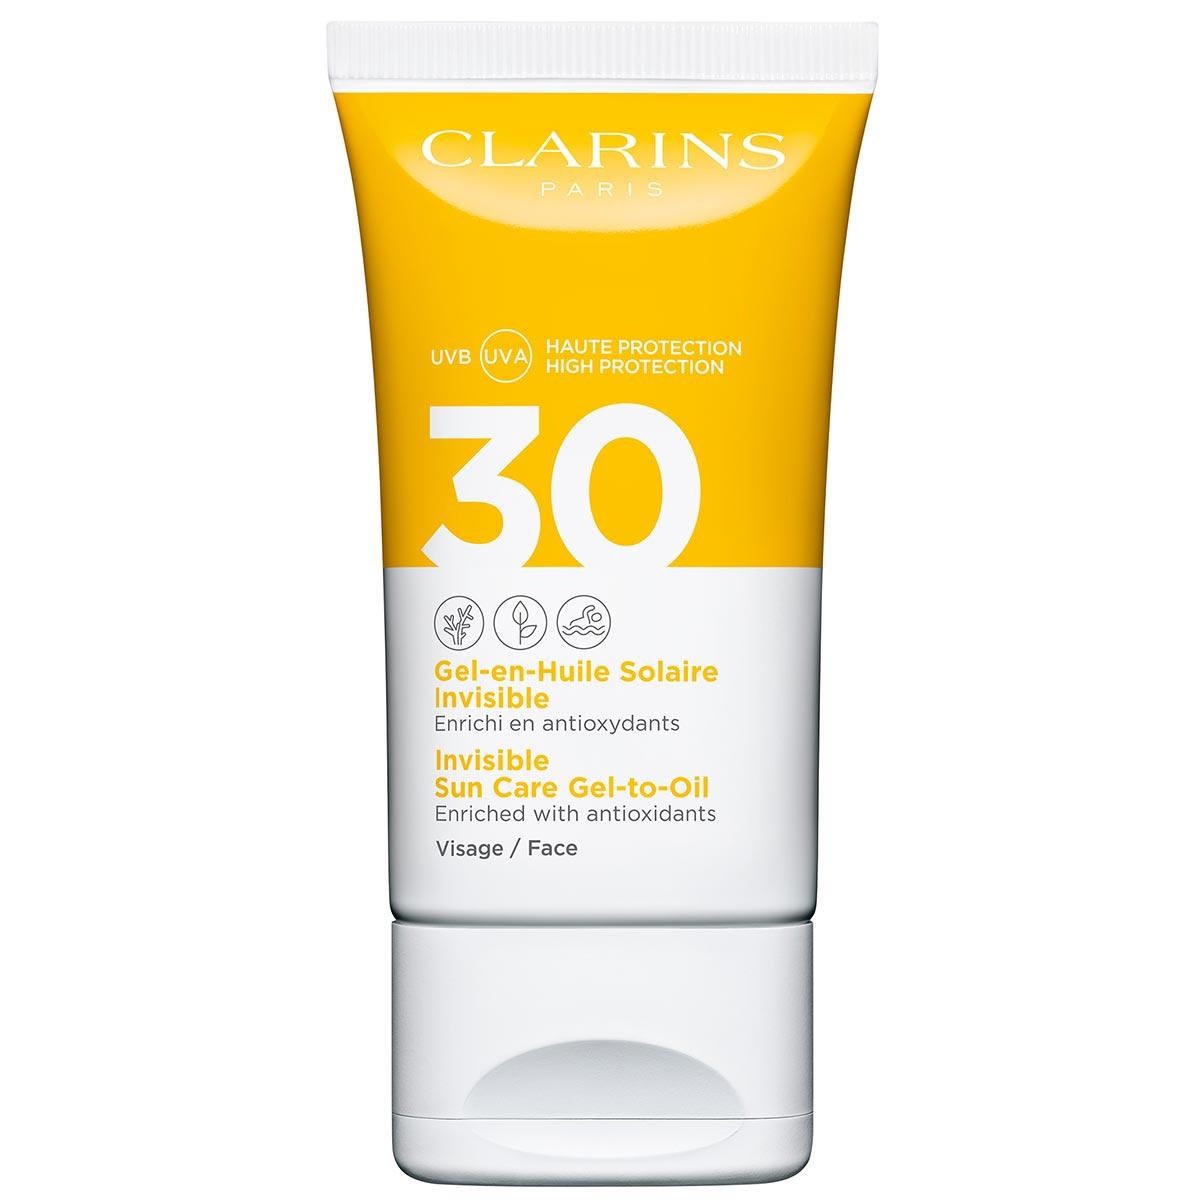 Clarins - Gel-en-Huile Solaire Invisible Visage - UVA/UVB30 50 ml